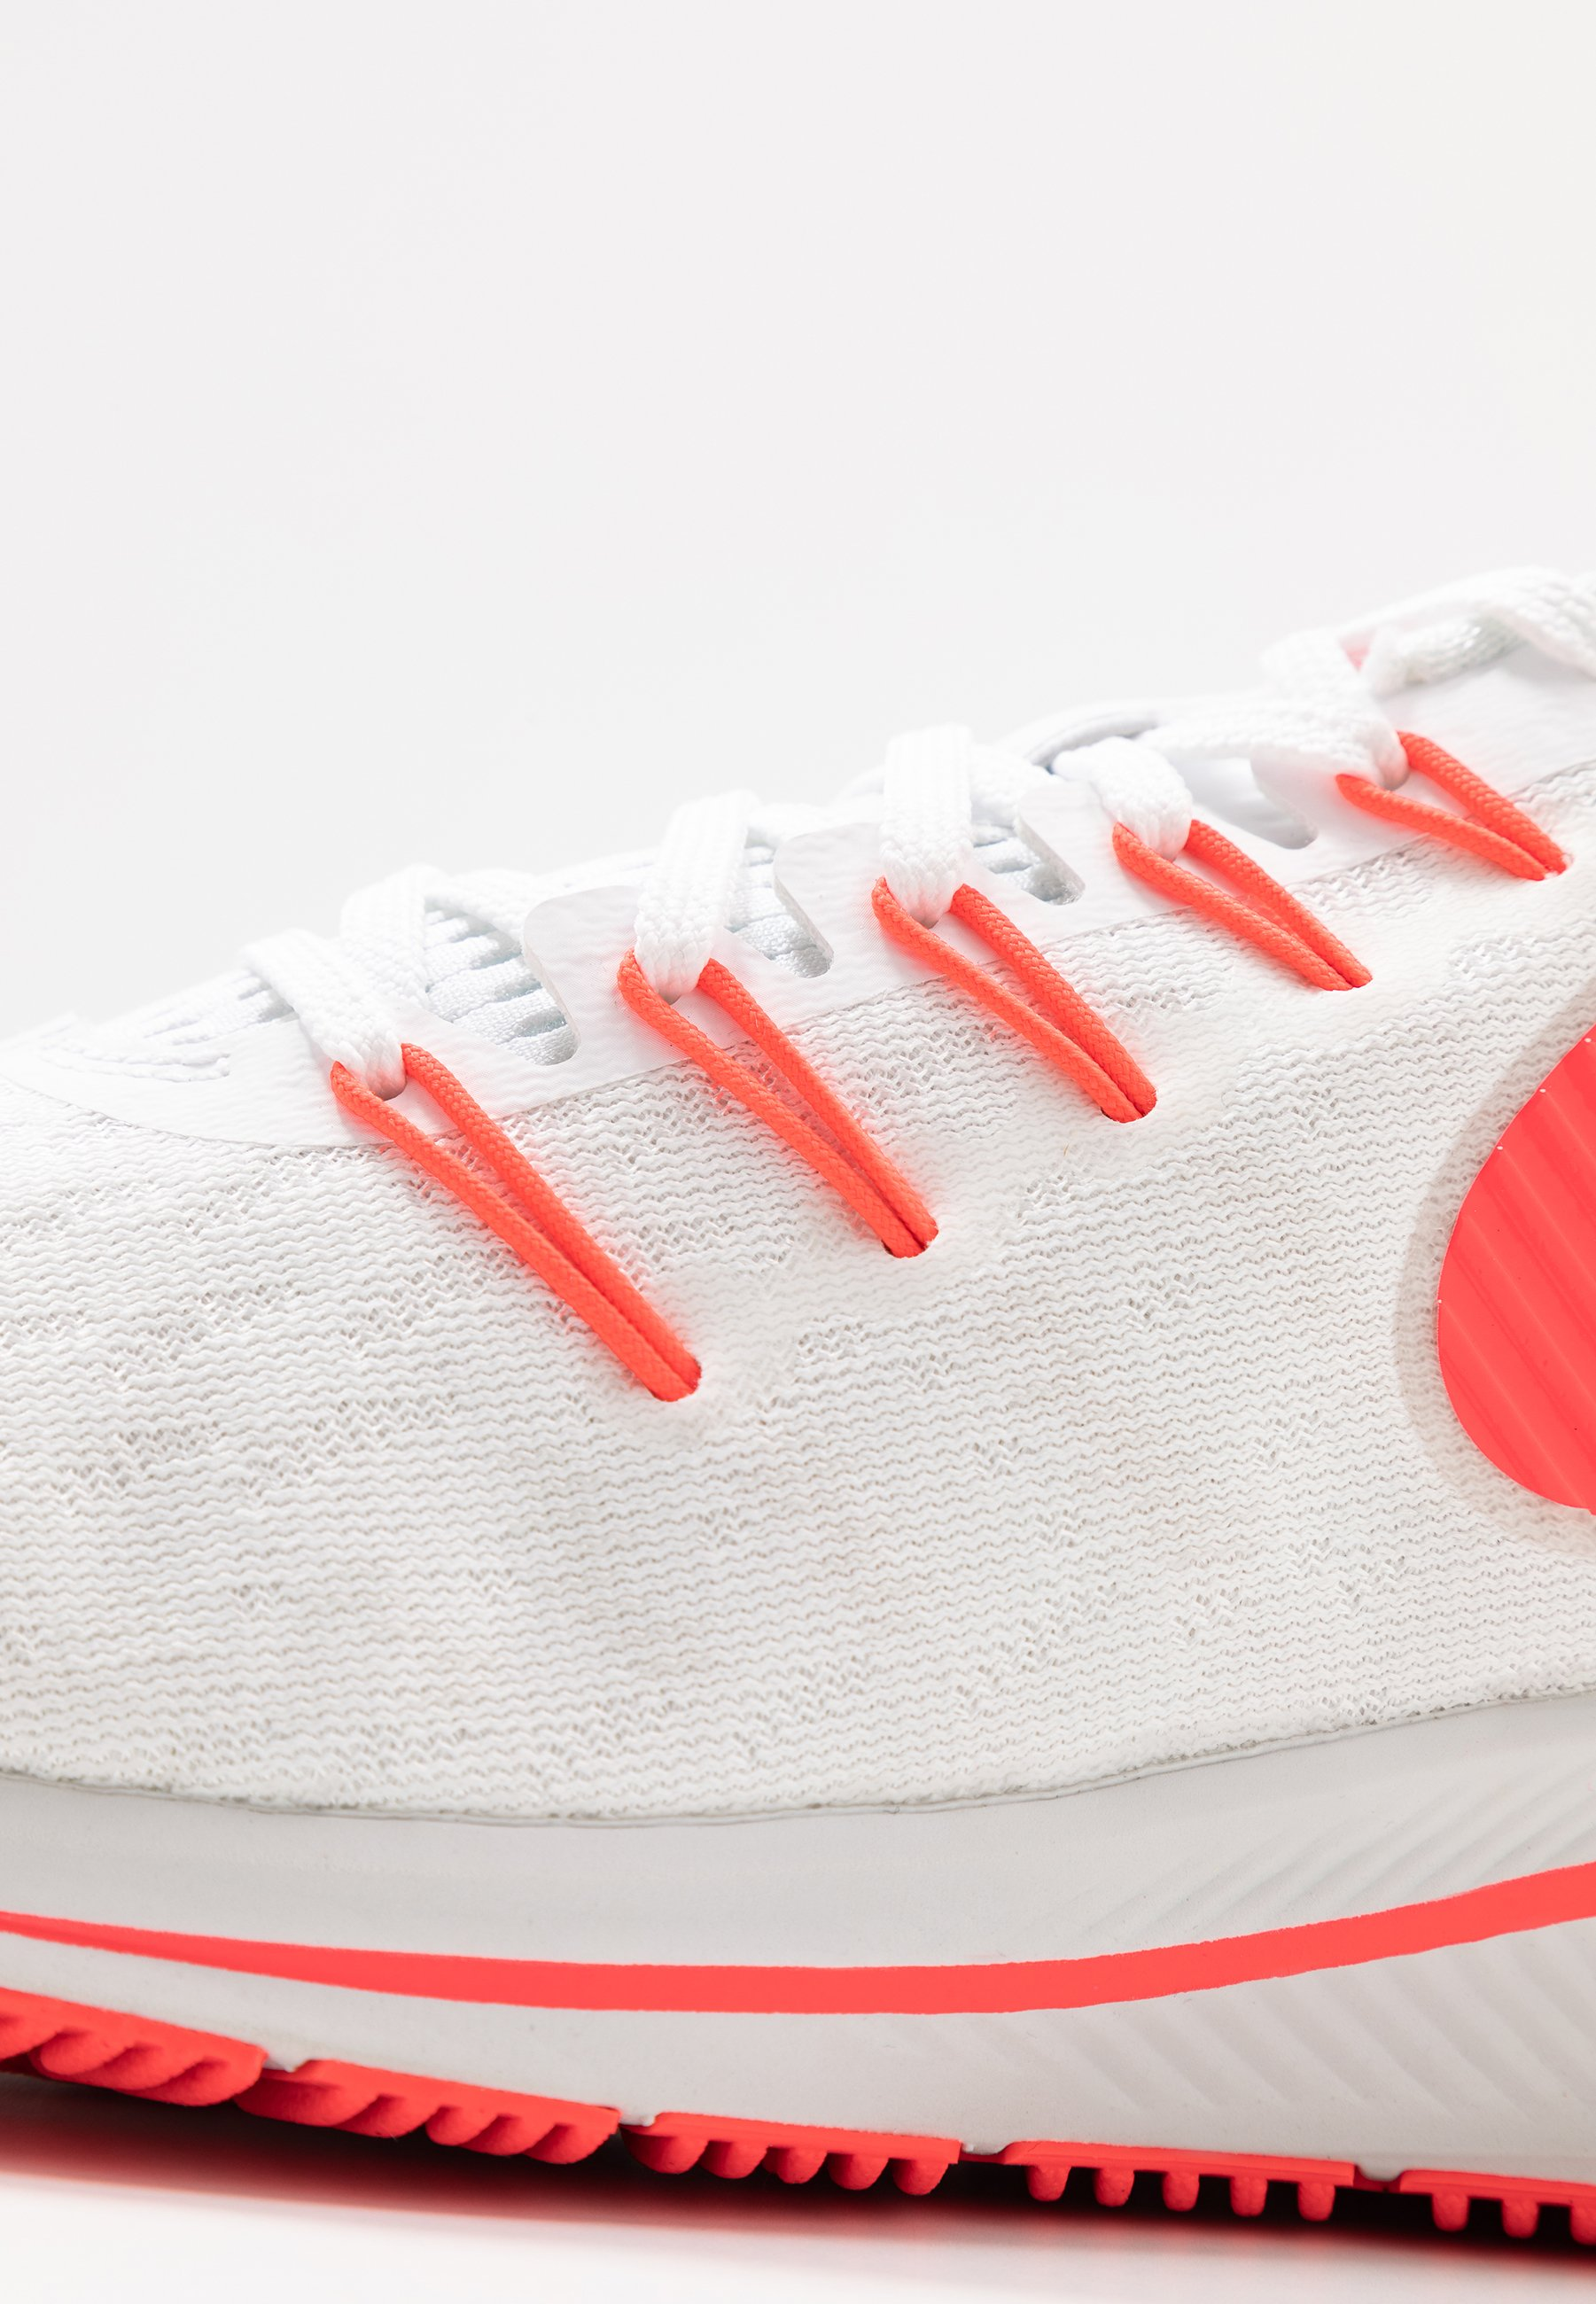 Nike Performance Air Zoom Vomero - Neutral Running Shoes White/laser Crimson/track Red/platinum Tint/light Smoke Grey/photon Dust